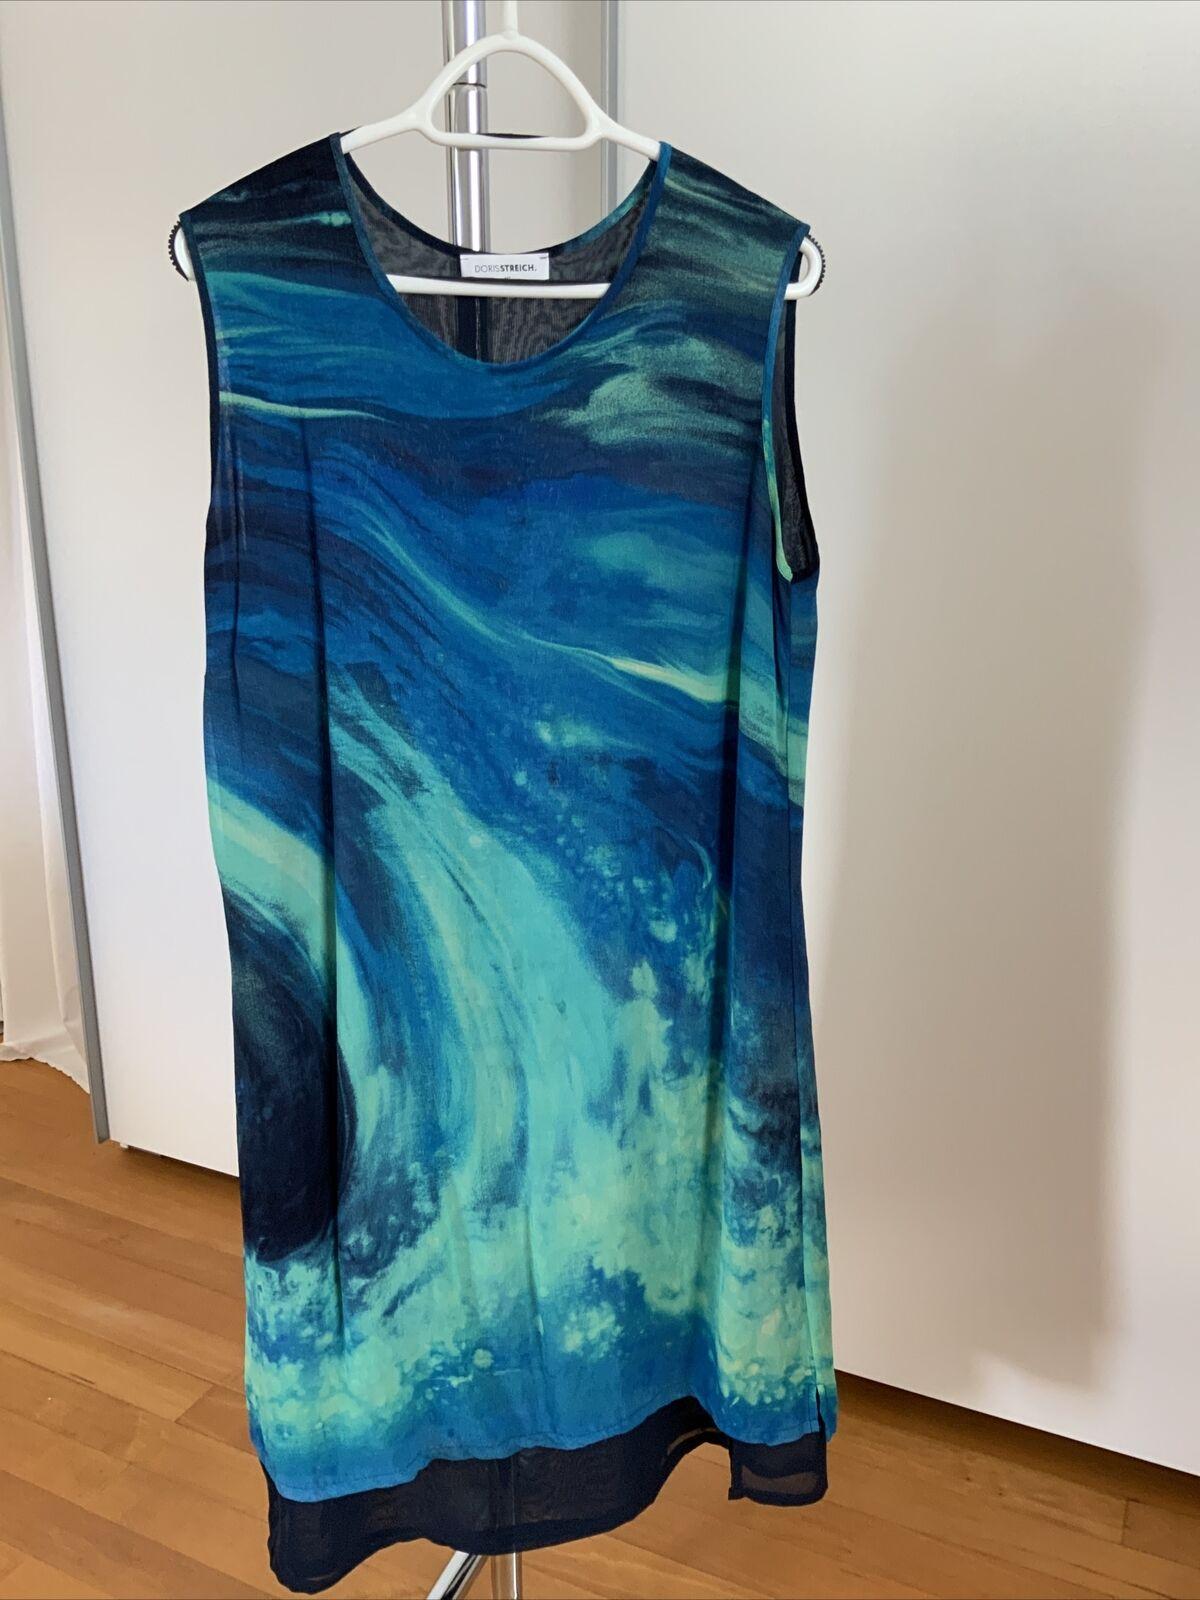 DORIS STREICH ~ Kleid Ärmellos -Gr. 46 Neuwertig Mehrfarbig